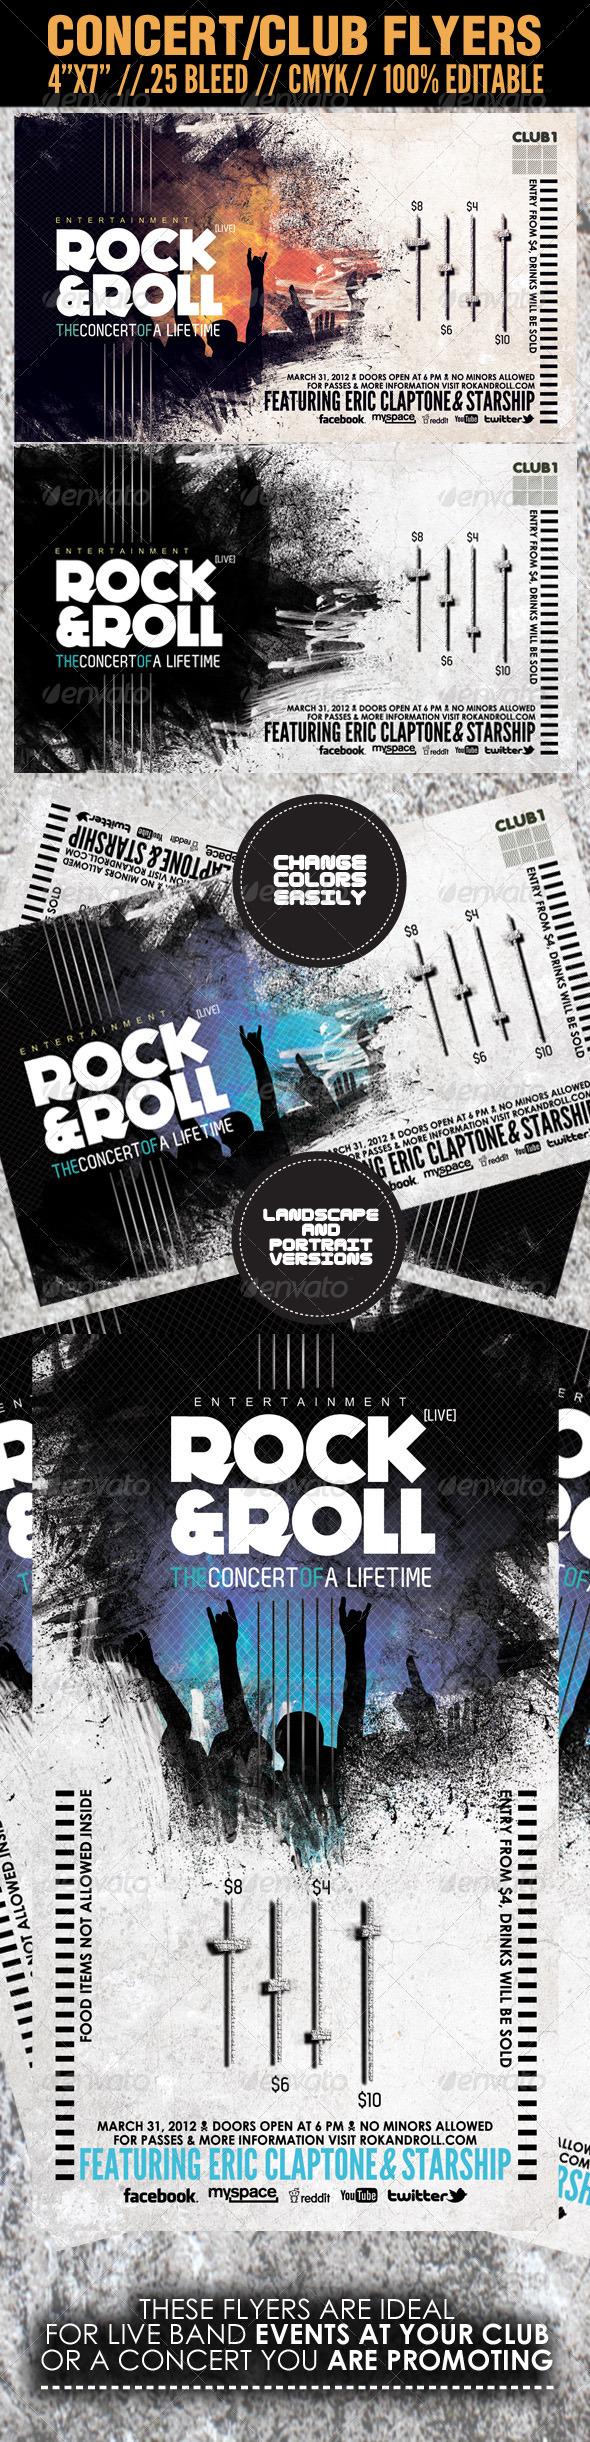 Adobe photoshop concert poster templates